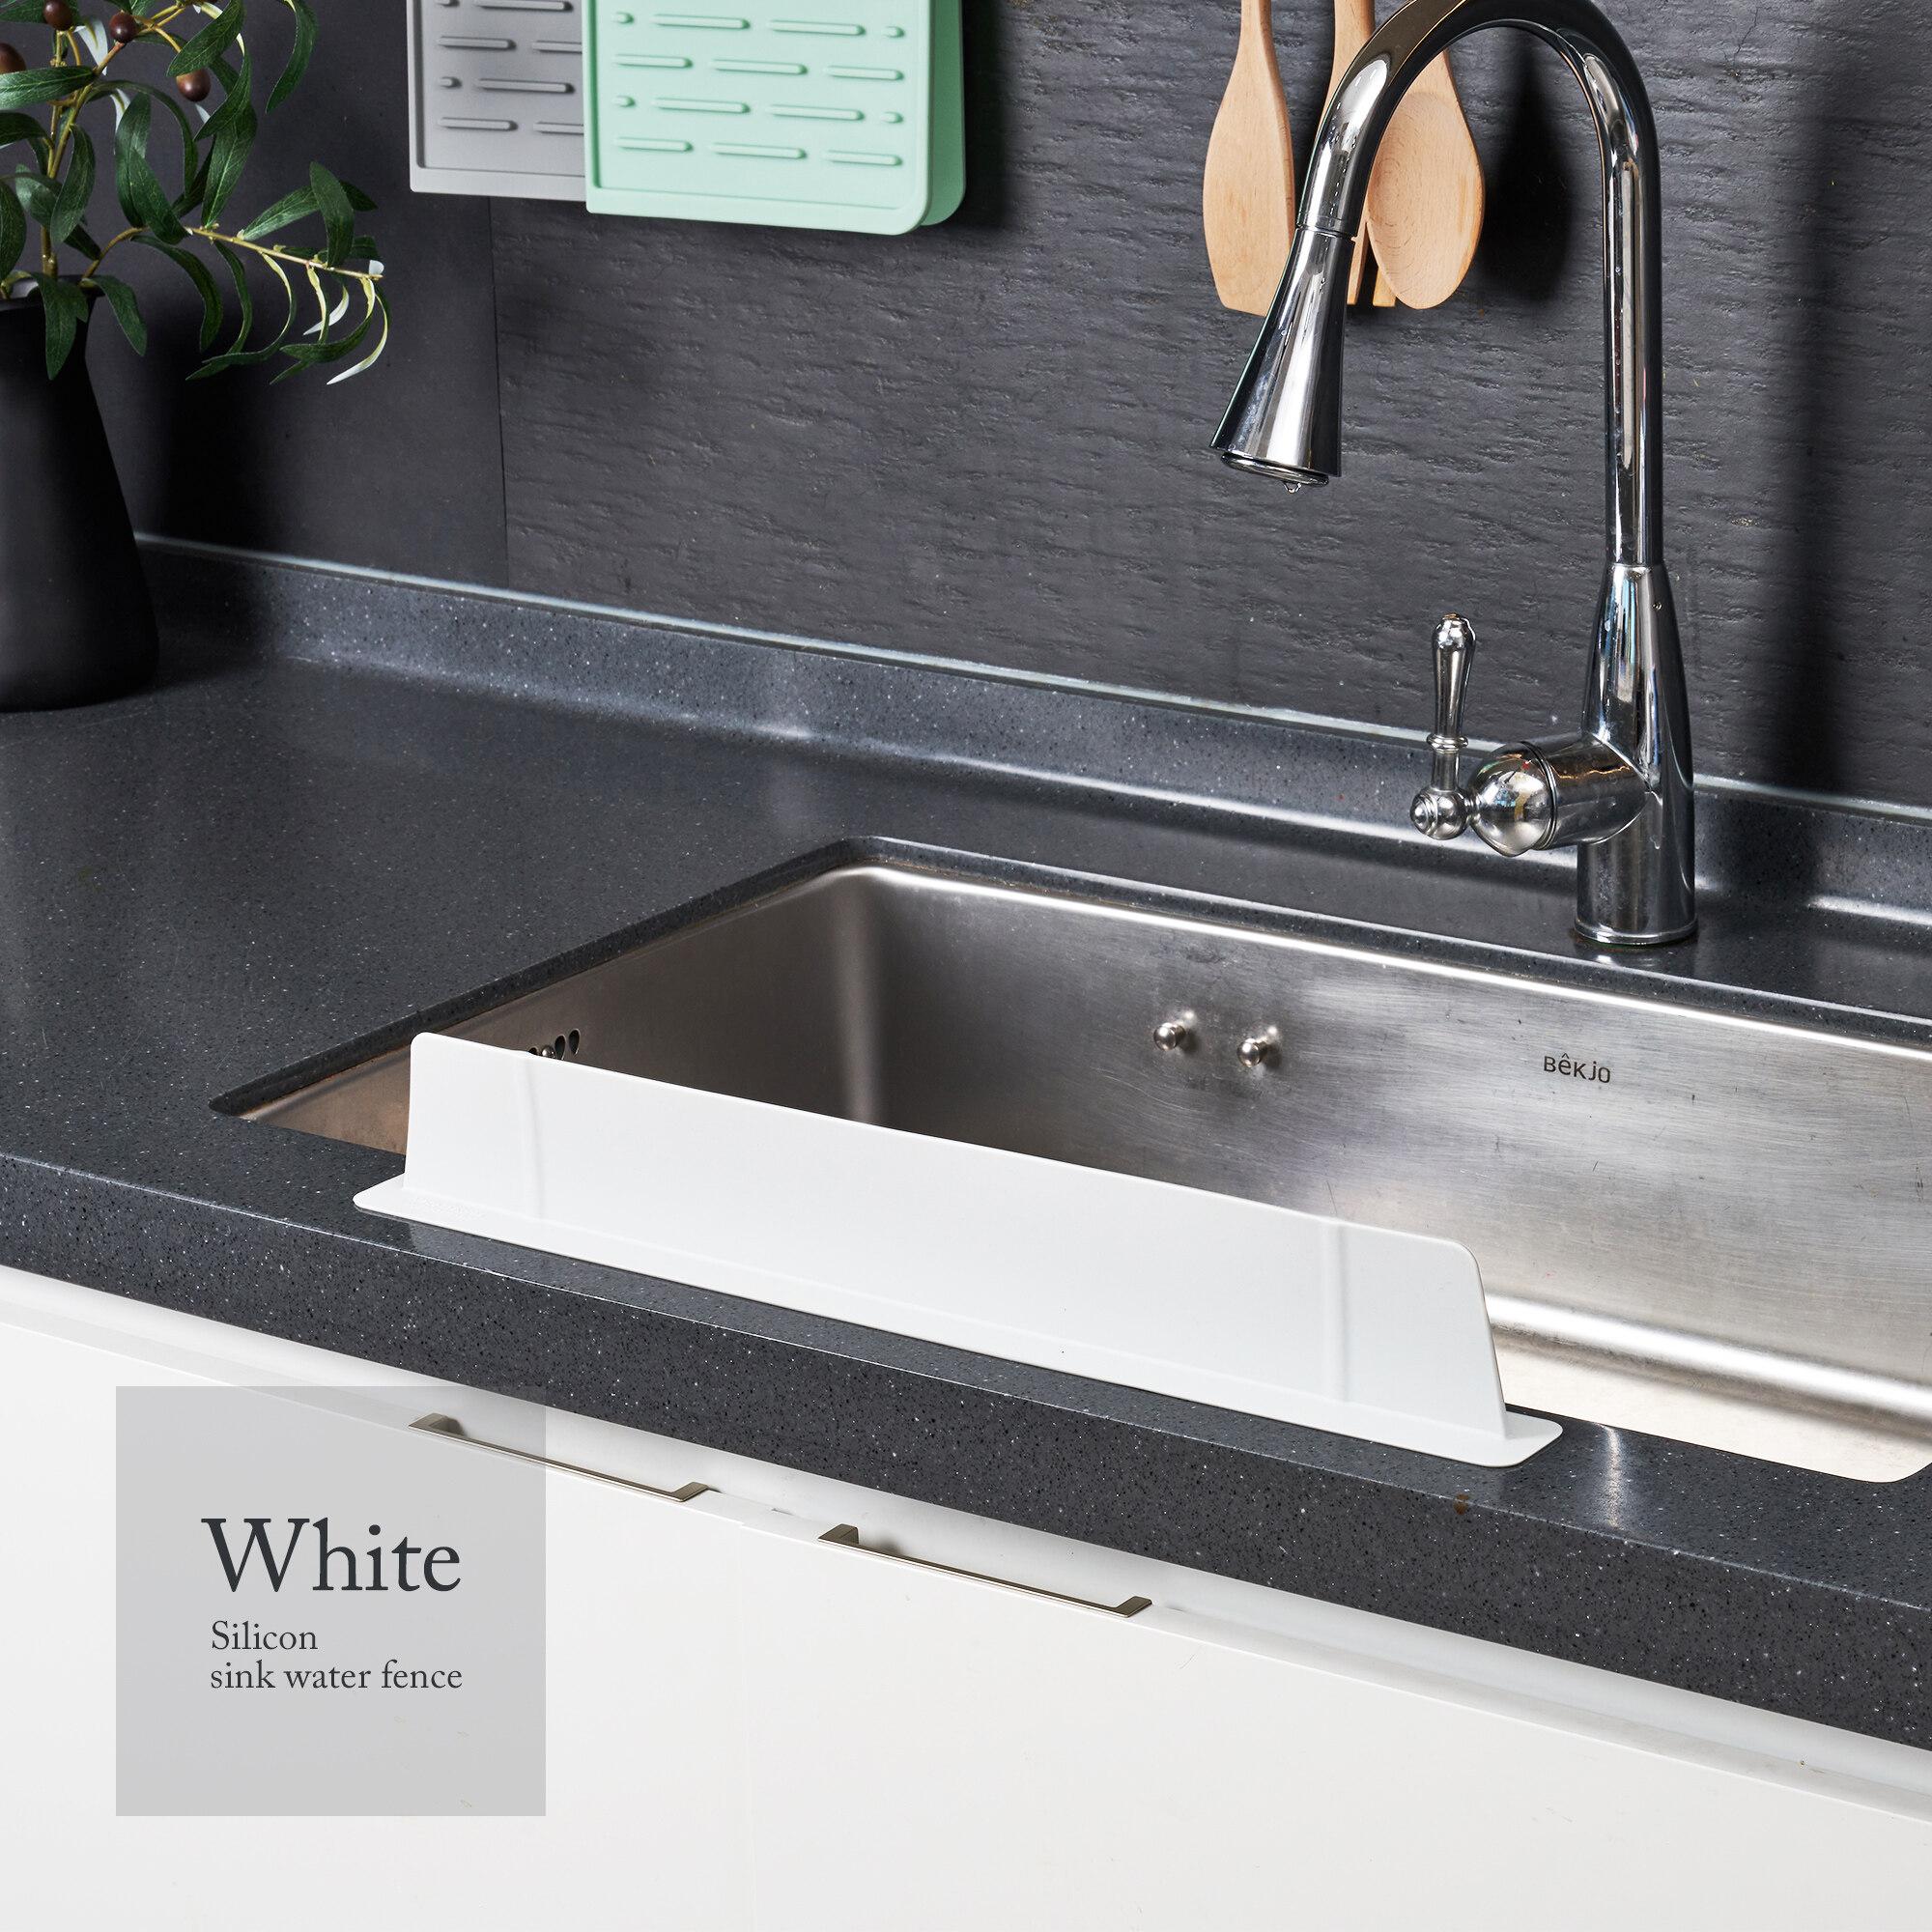 cimelax sink splash guard premium silicone water splash guard for kitchen sink bathroom and island sinks water stopper water barrier fda approved